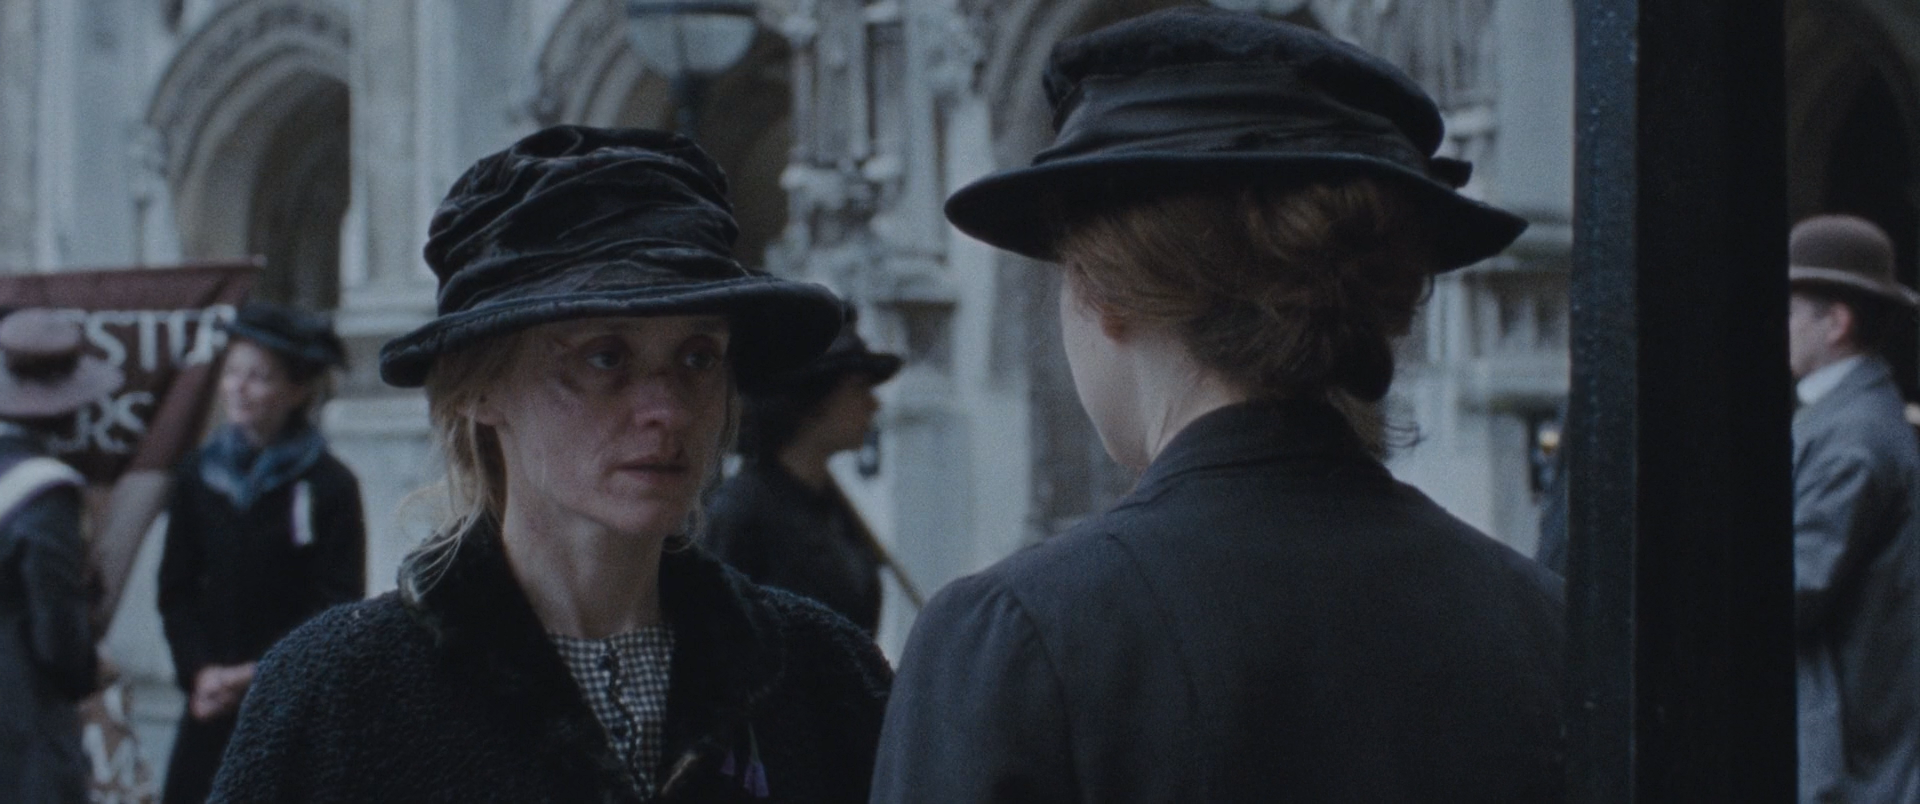 Diren: Zamanı Geldi - Suffragette | 2015 | BluRay 1080p x264 | DuaL TR-EN - Teklink indir